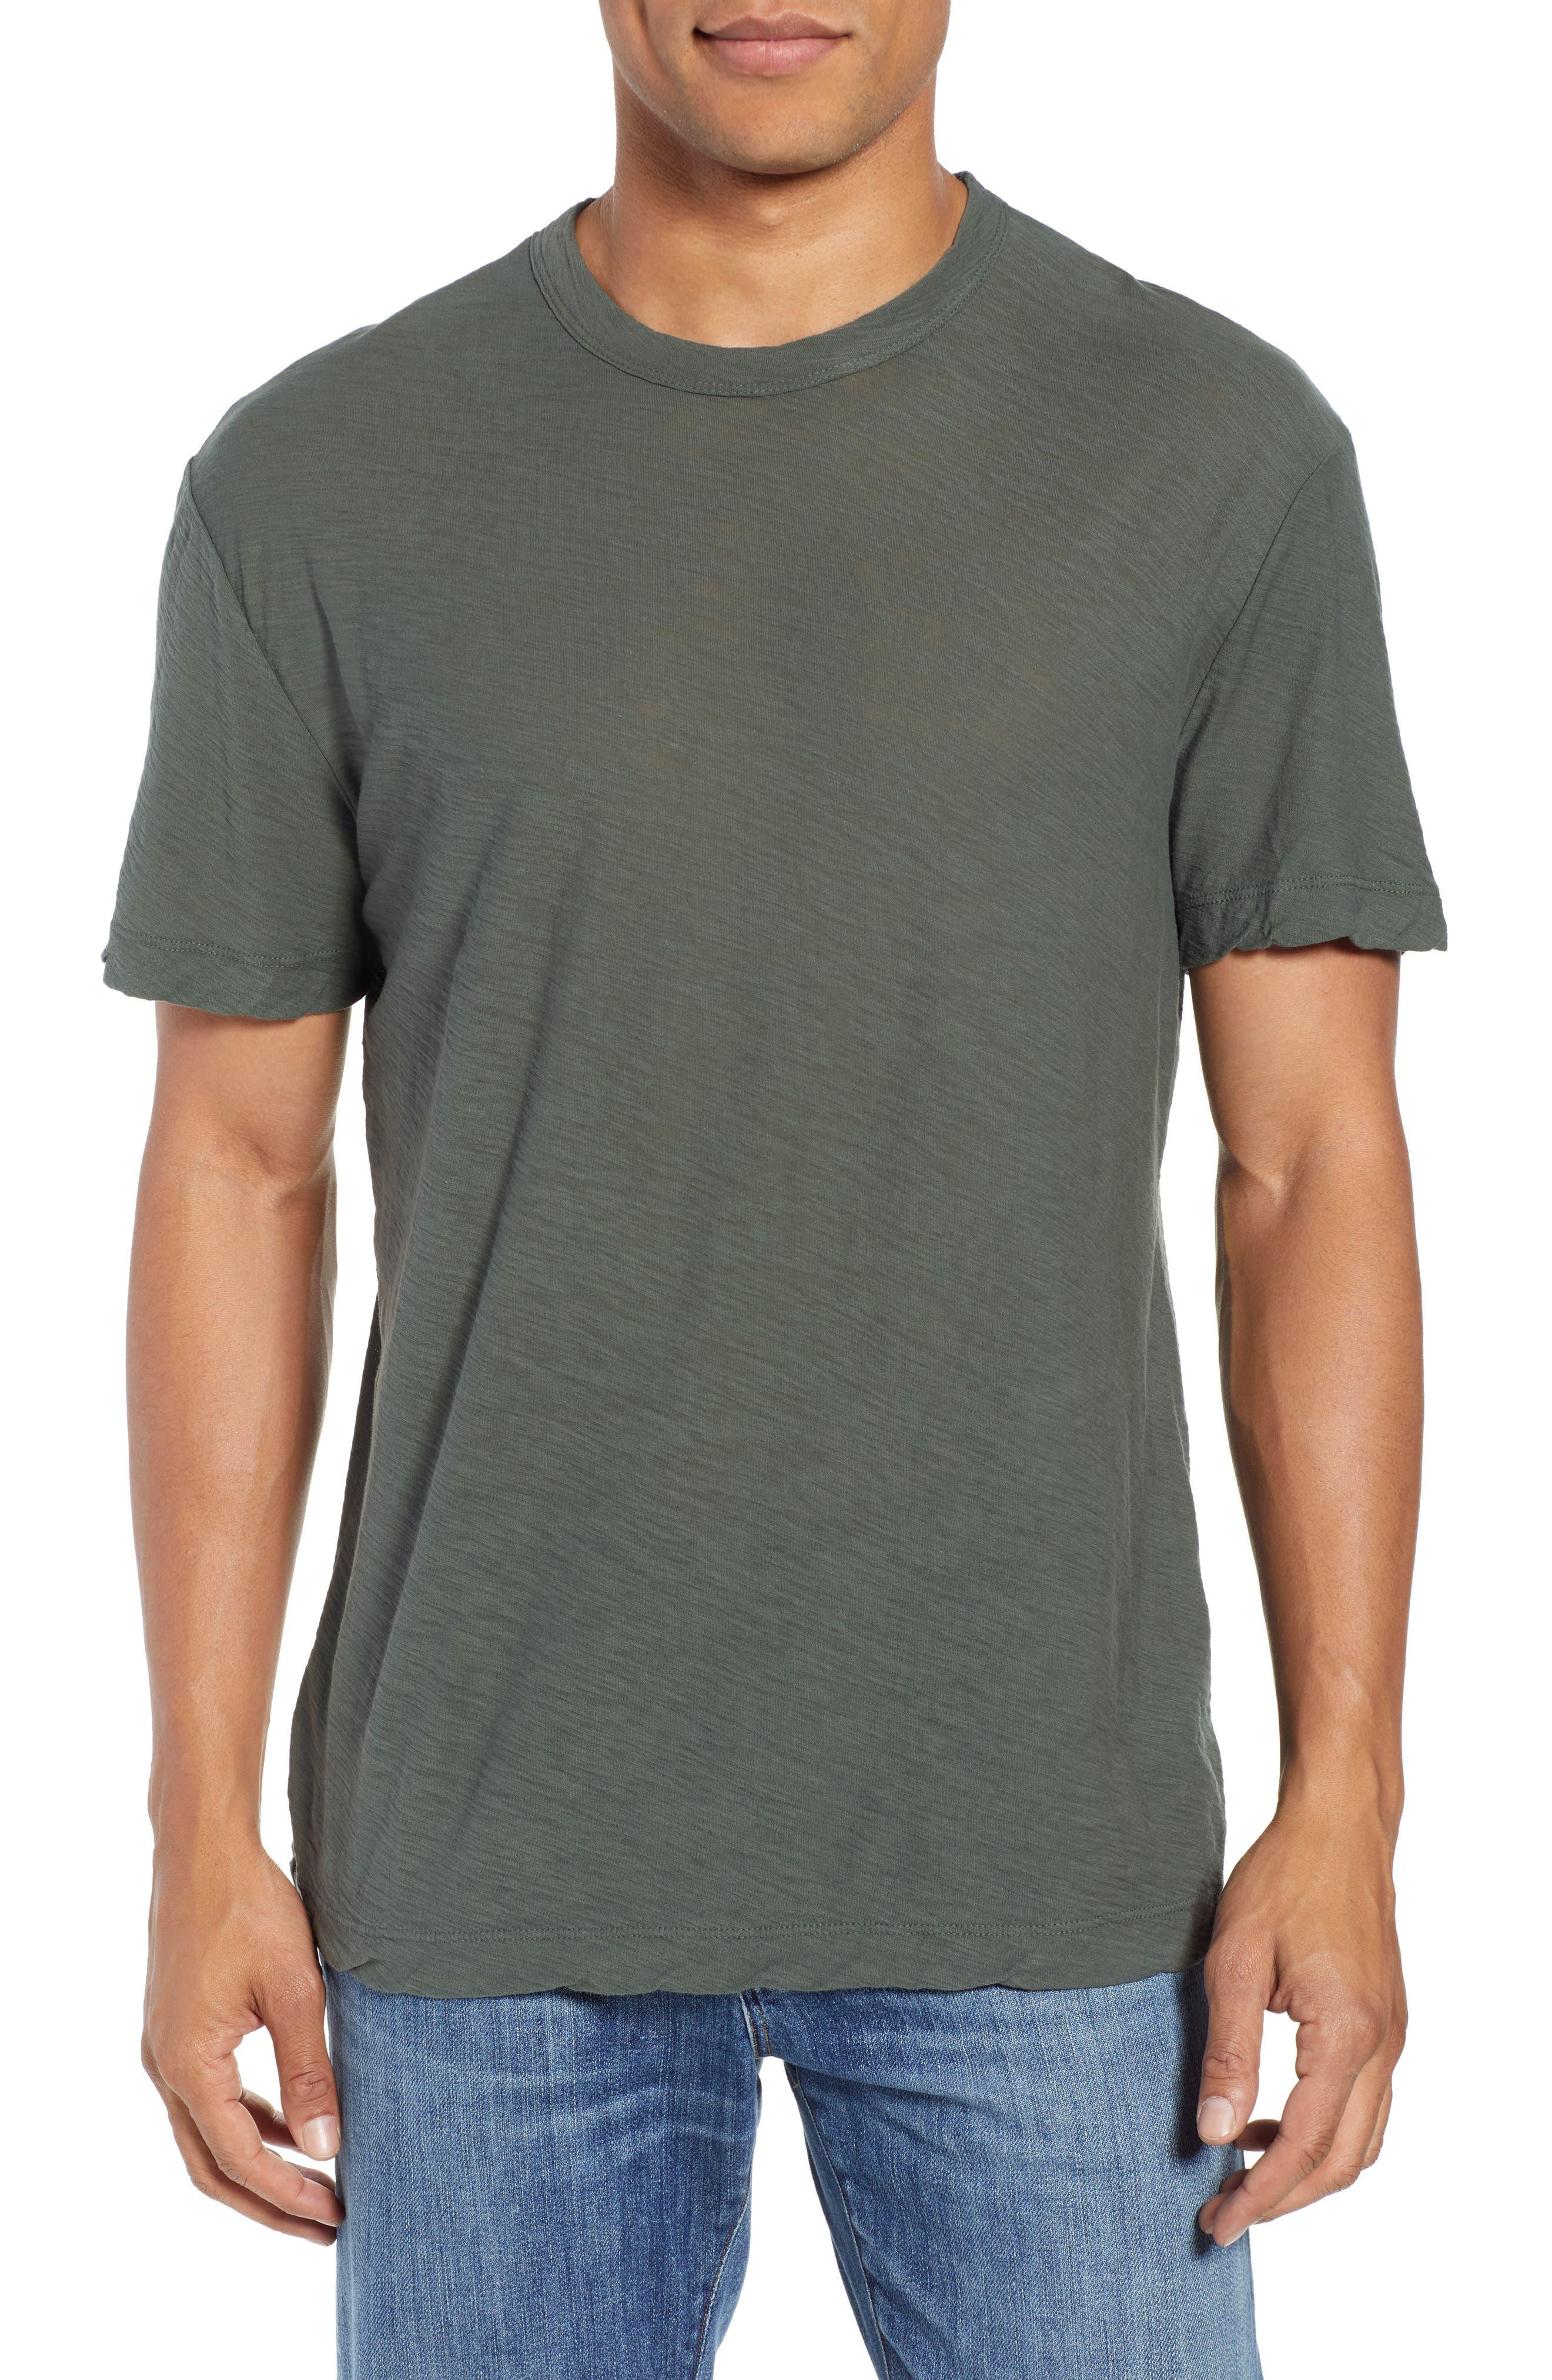 Regular Fit Shirt,                         Main,                         color, 304